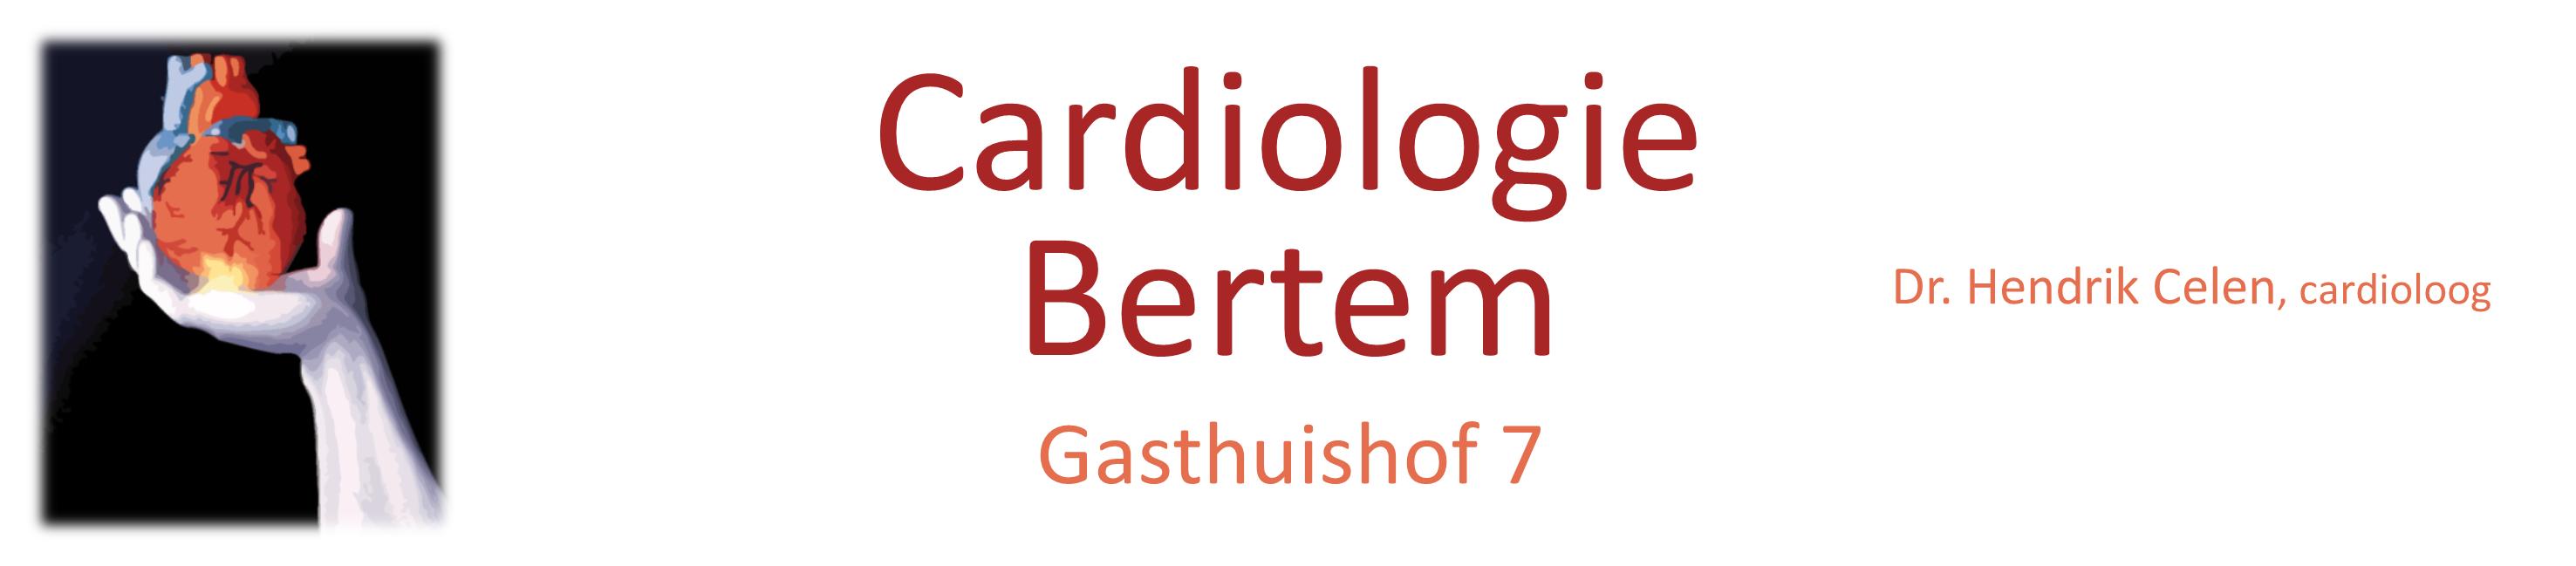 Cardiologie Bertem